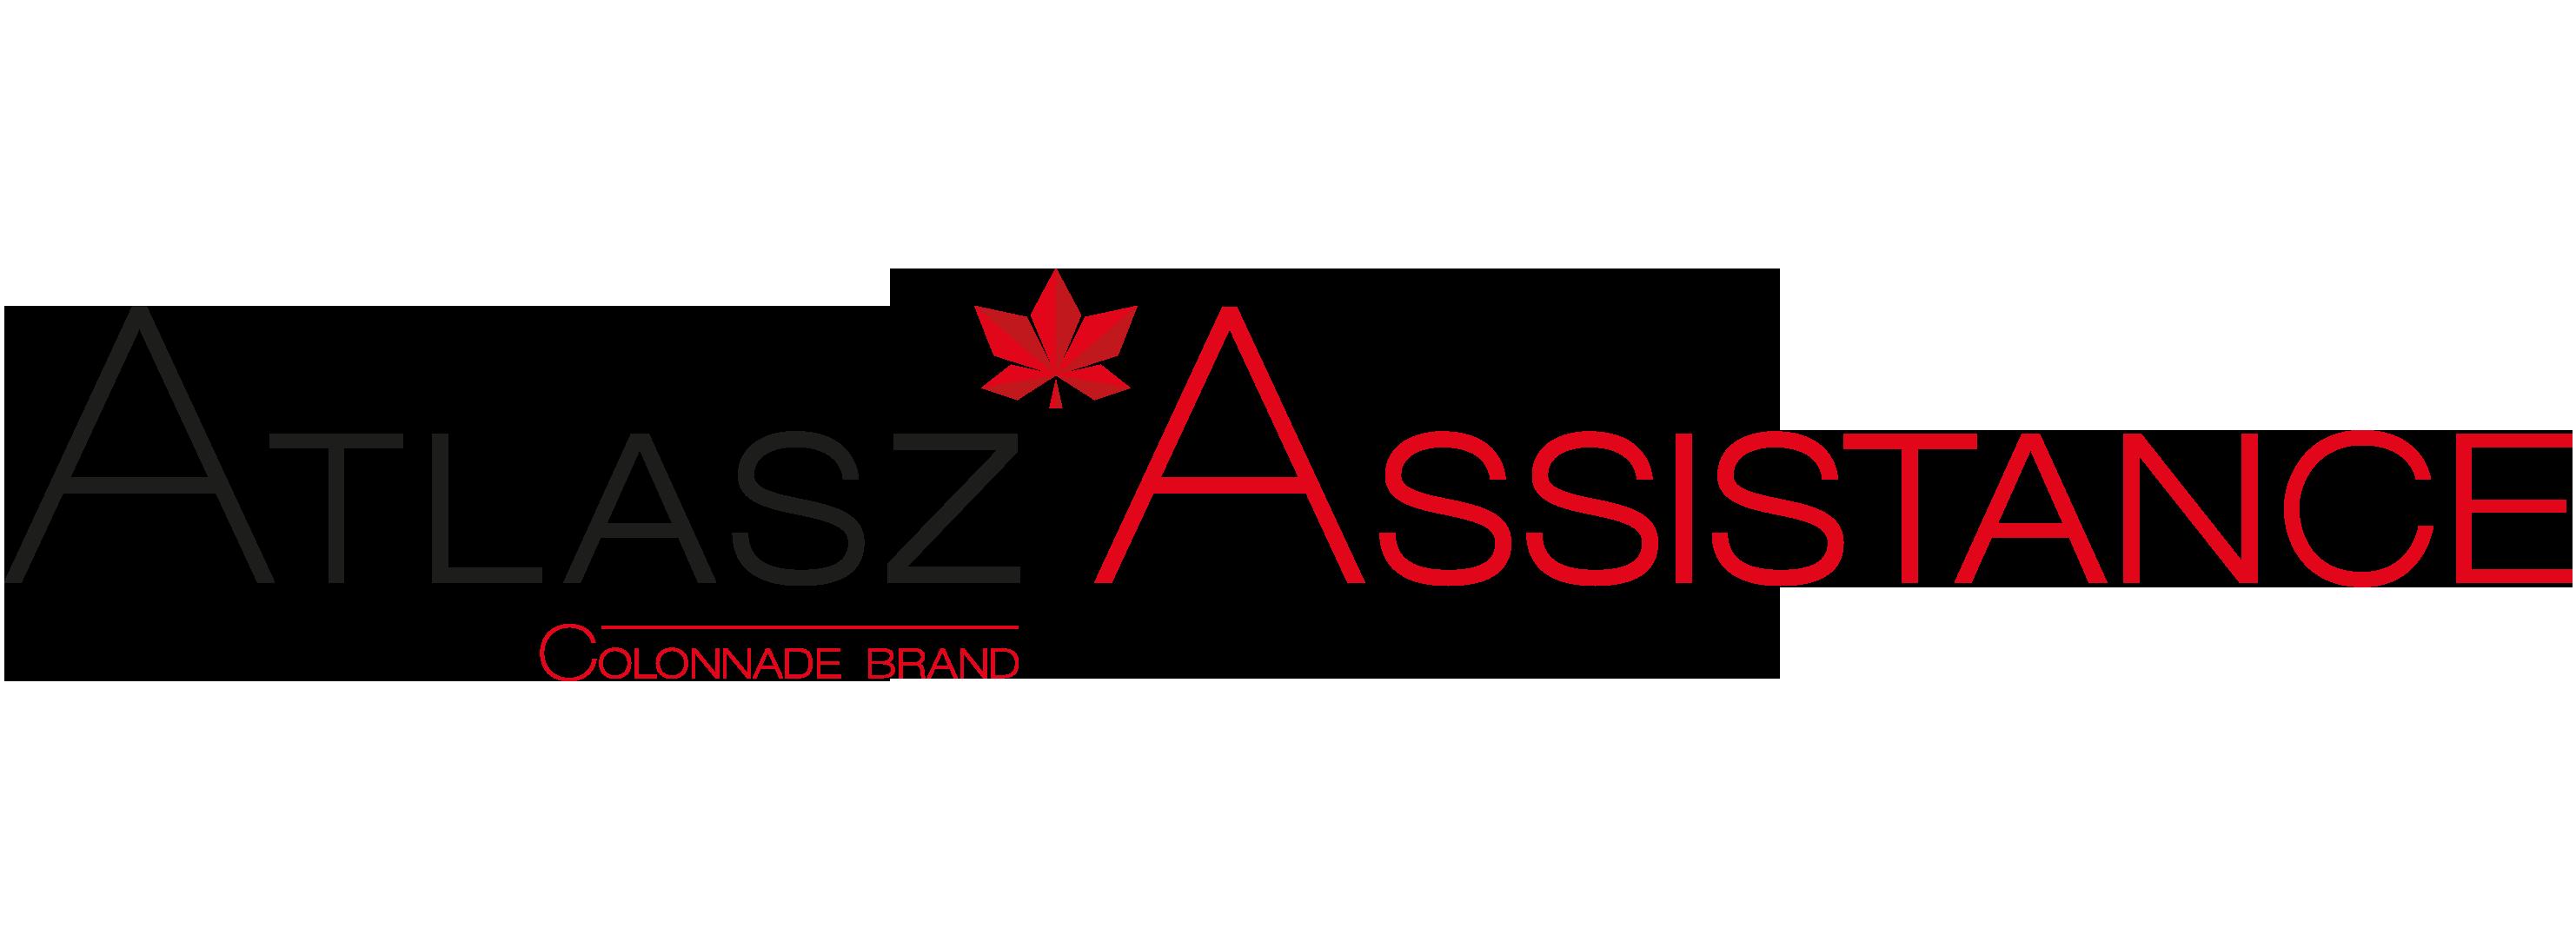 Atlasz Assistance